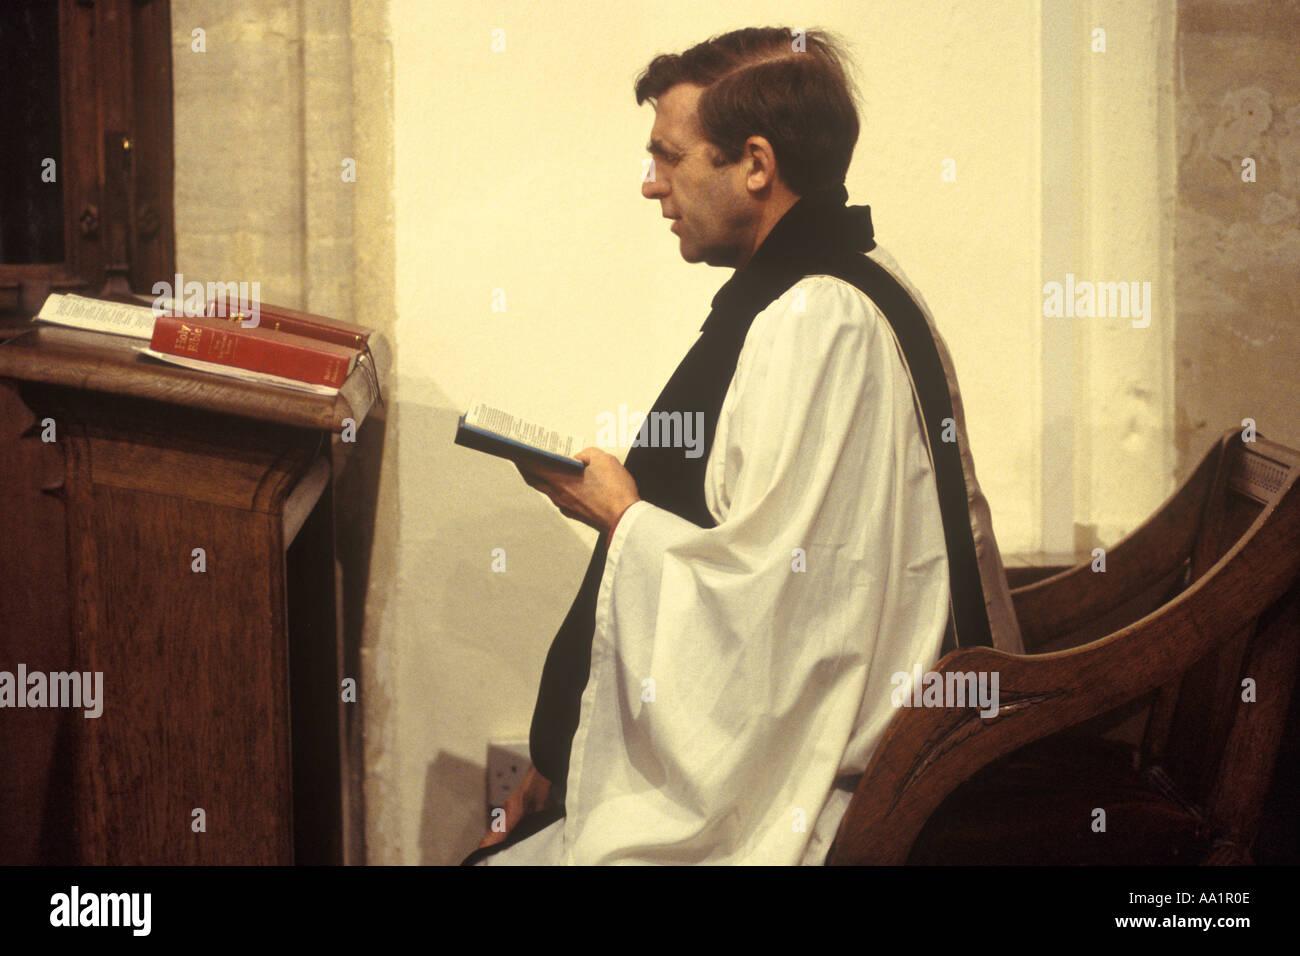 Sunday church service Reverent Rev Martin Down Church of St Saint Nicolas Ashill Norfolk HOMER SYKES - Stock Image